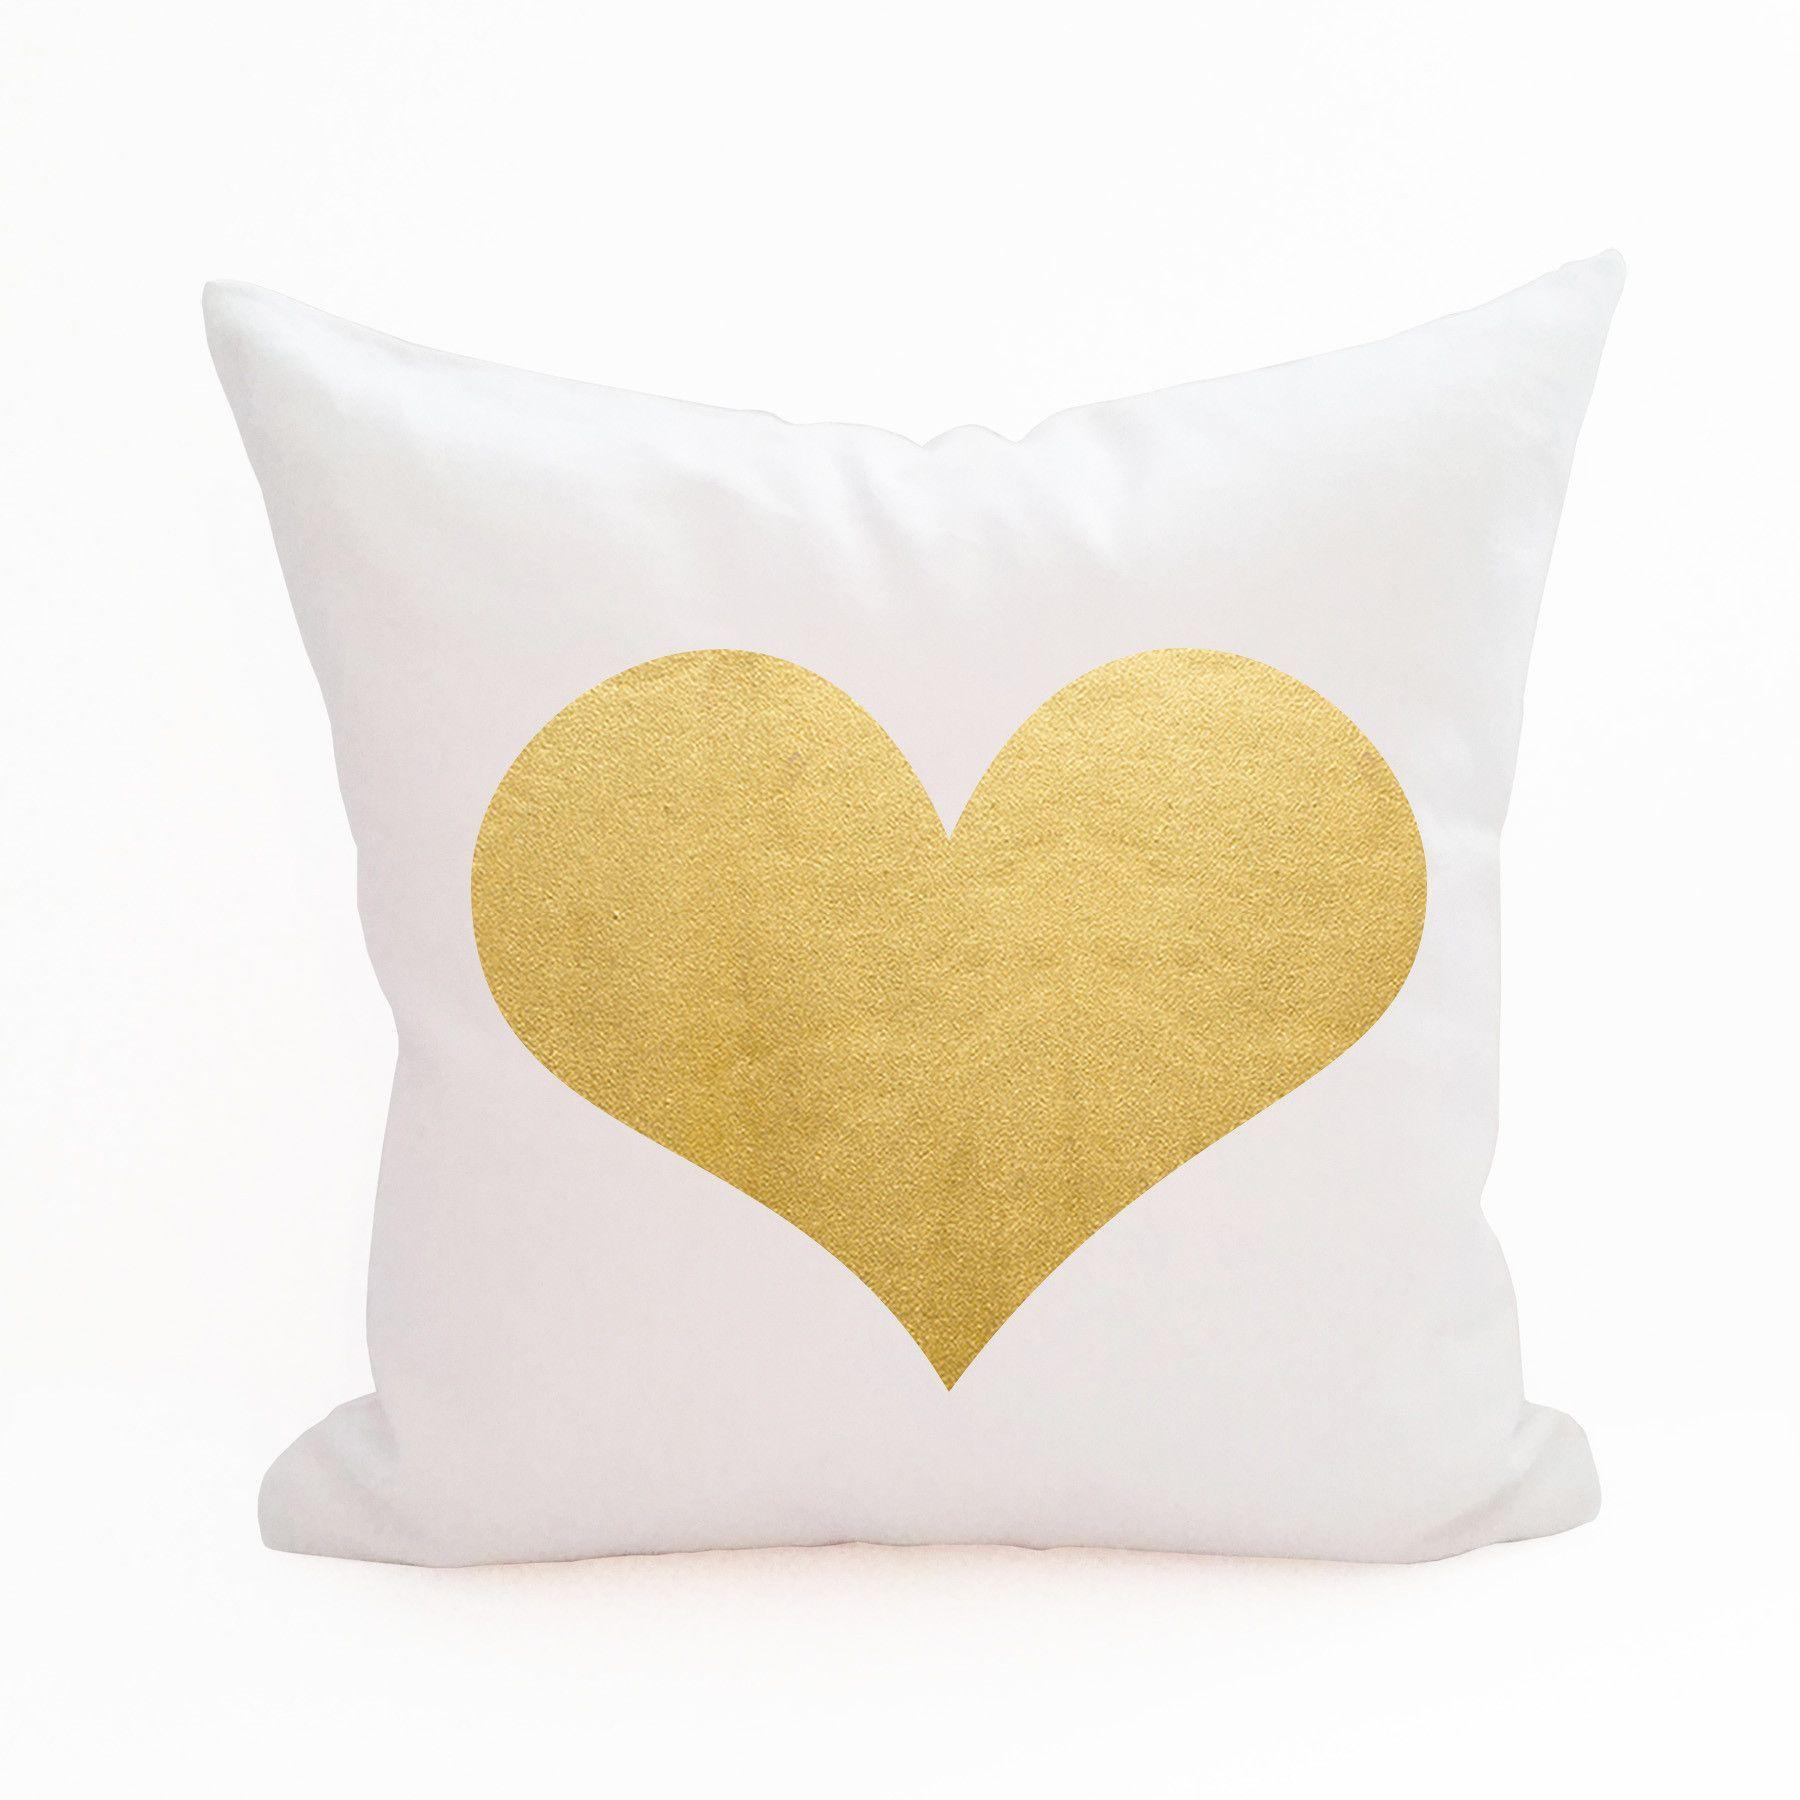 Heart pillow cover heart pillow cotton canvas and pillows